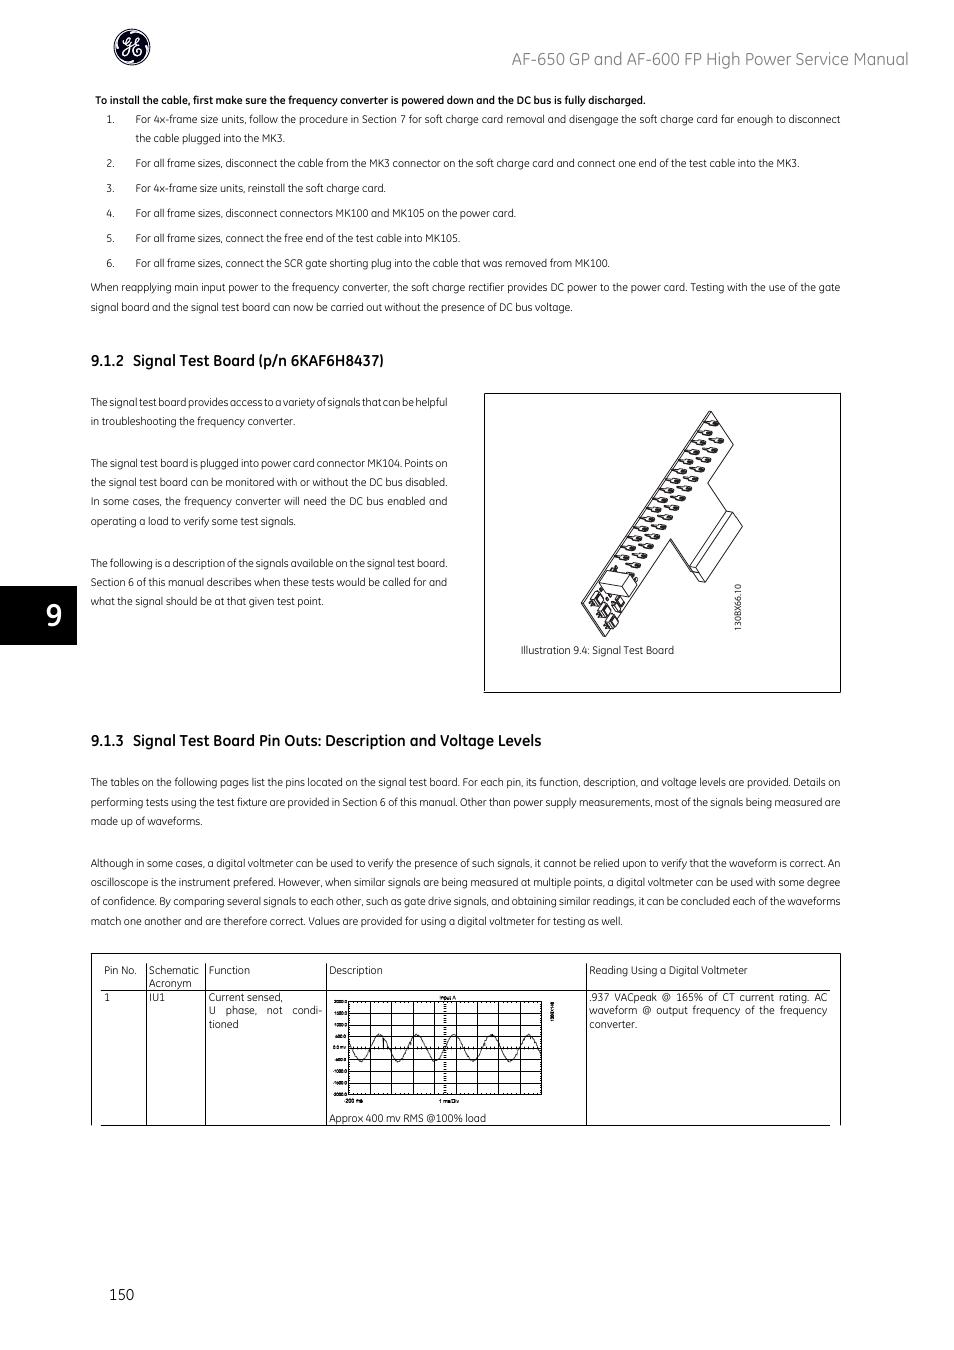 Ge Scr Manual Alarm Circuit Signalprocessing Diagram Seekiccom Array Industrial Solutions Af 600 Fp High Power 460v 575v 150hp And Rh Manualsdir